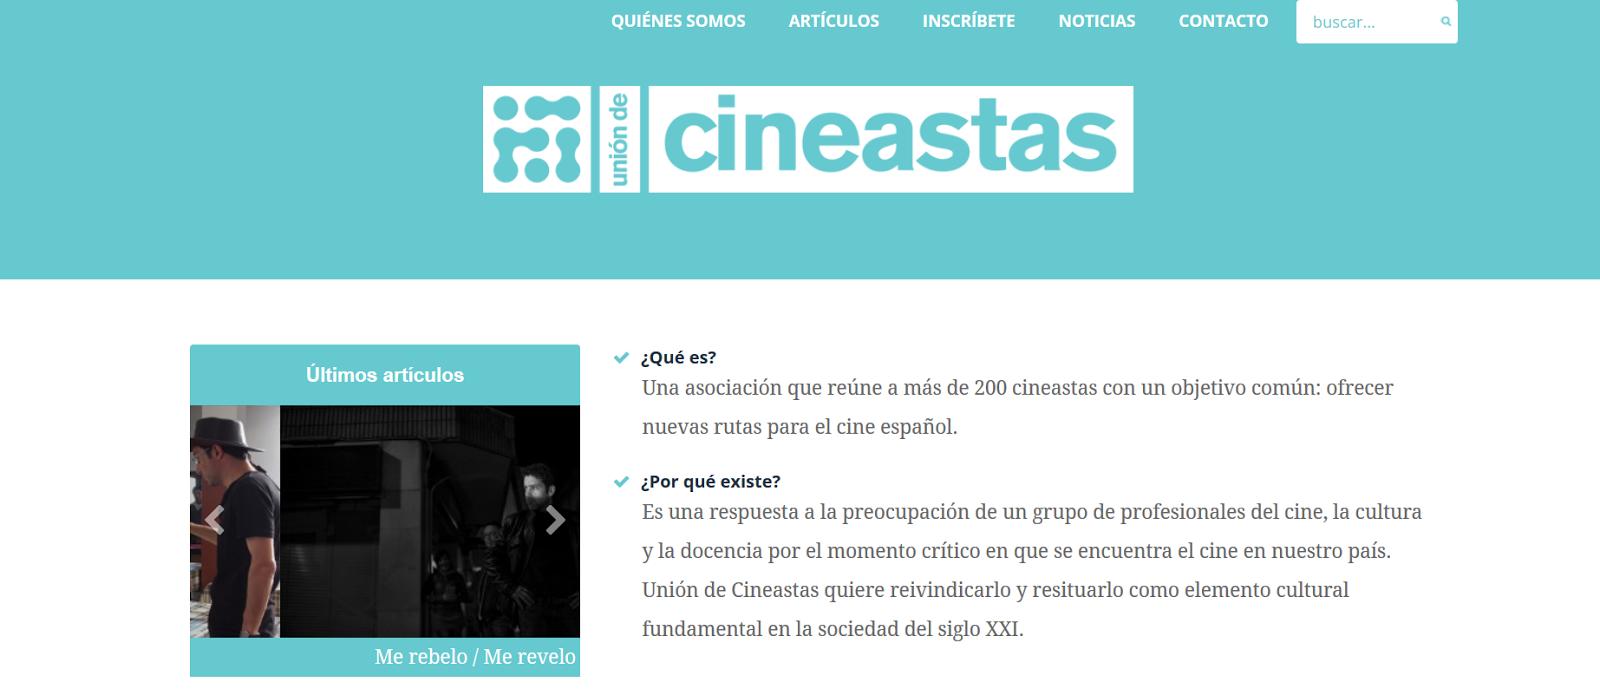 http://uniondecineastas.es/